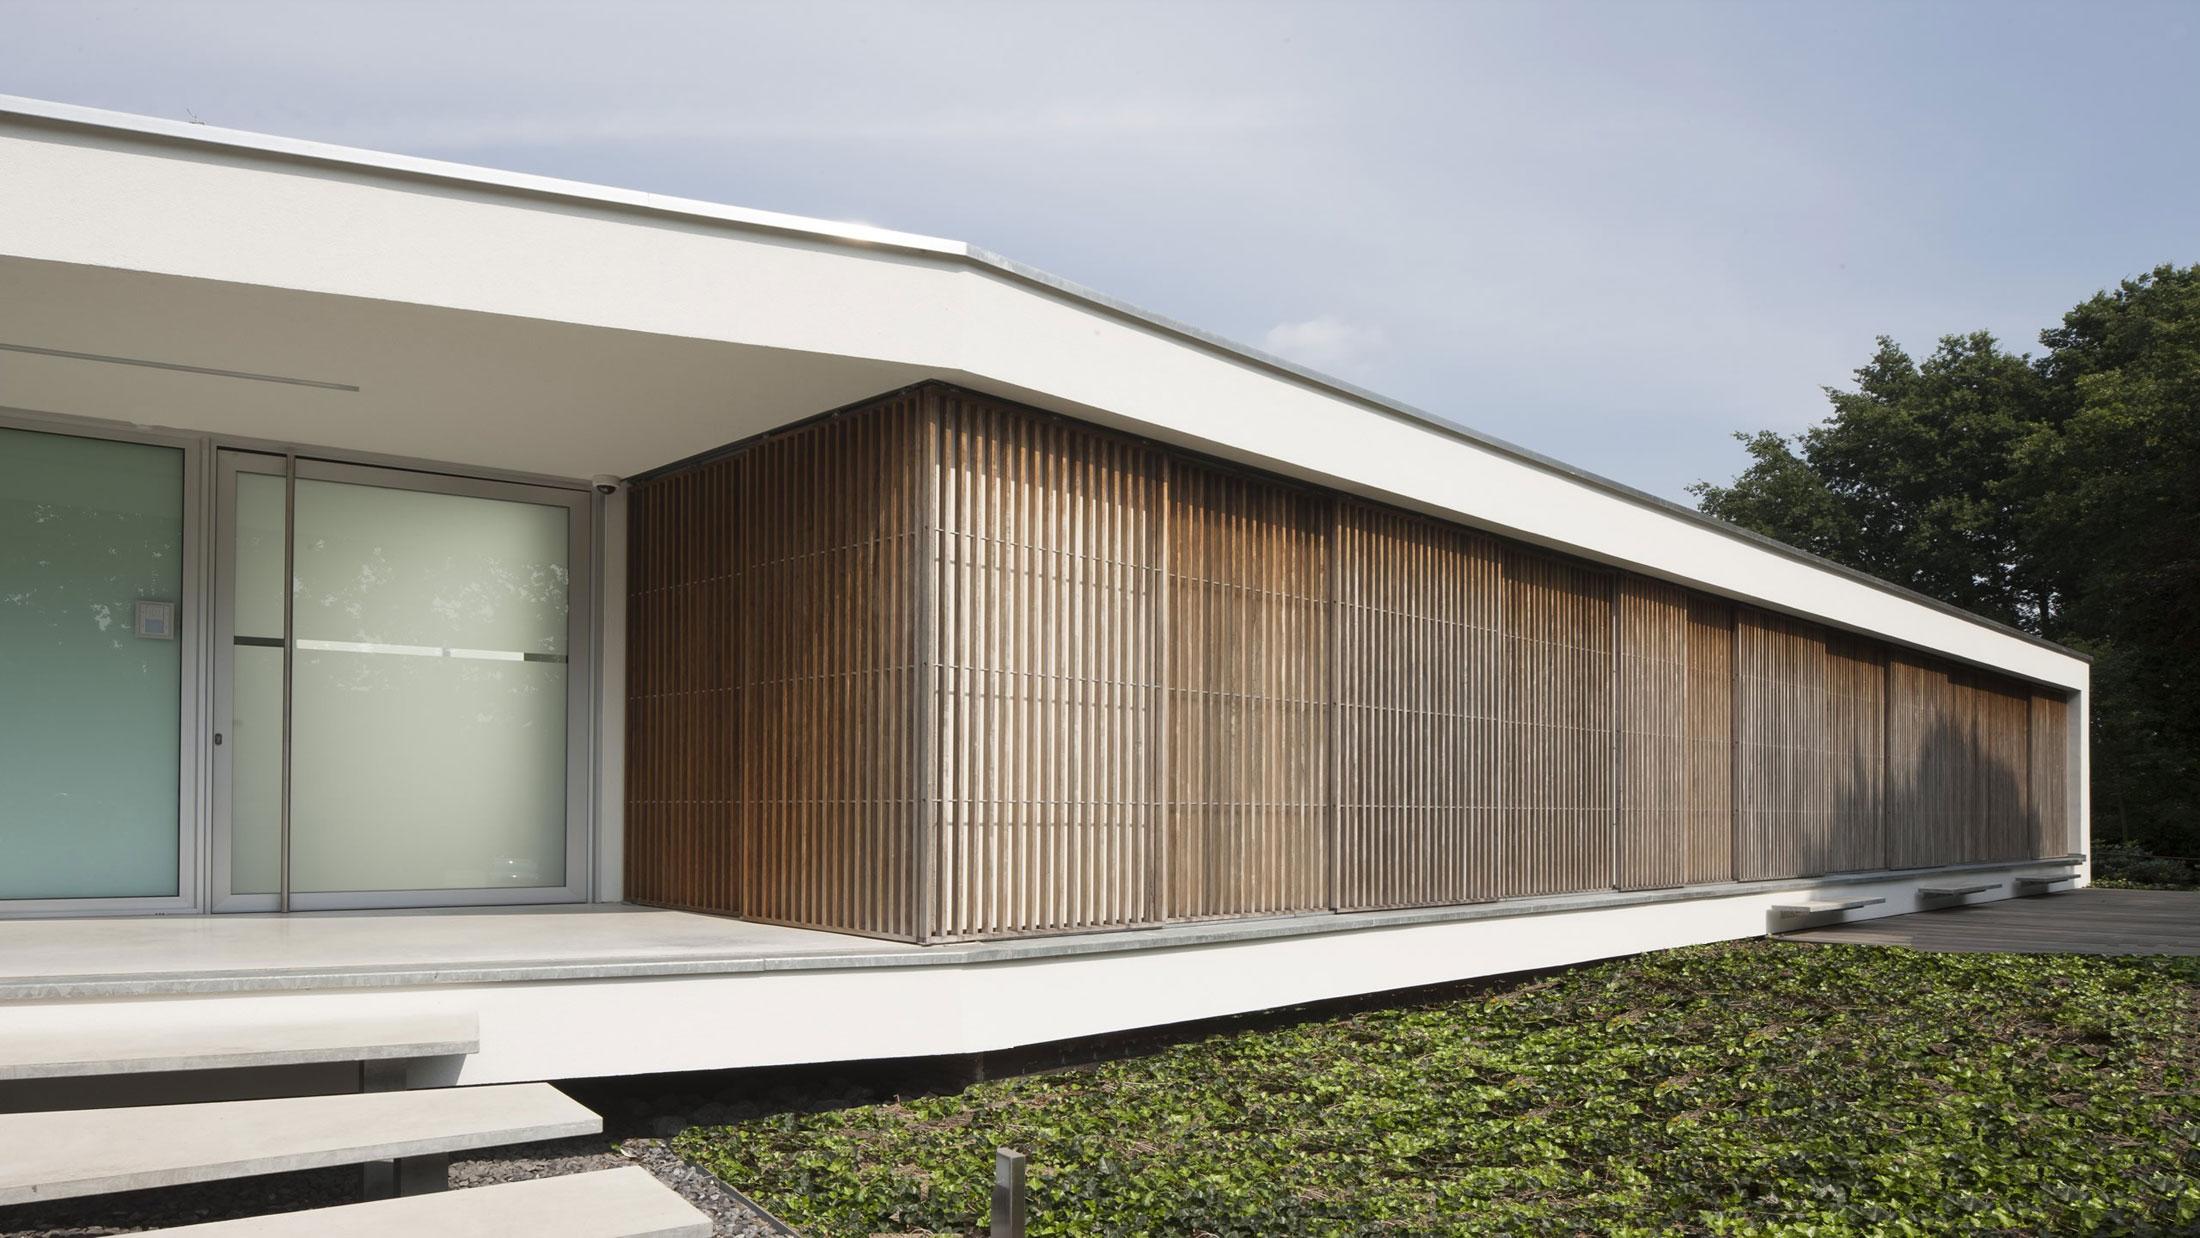 Boxed Villa Spee Haelen with Panoramic Windows by Lab32 architecten-07